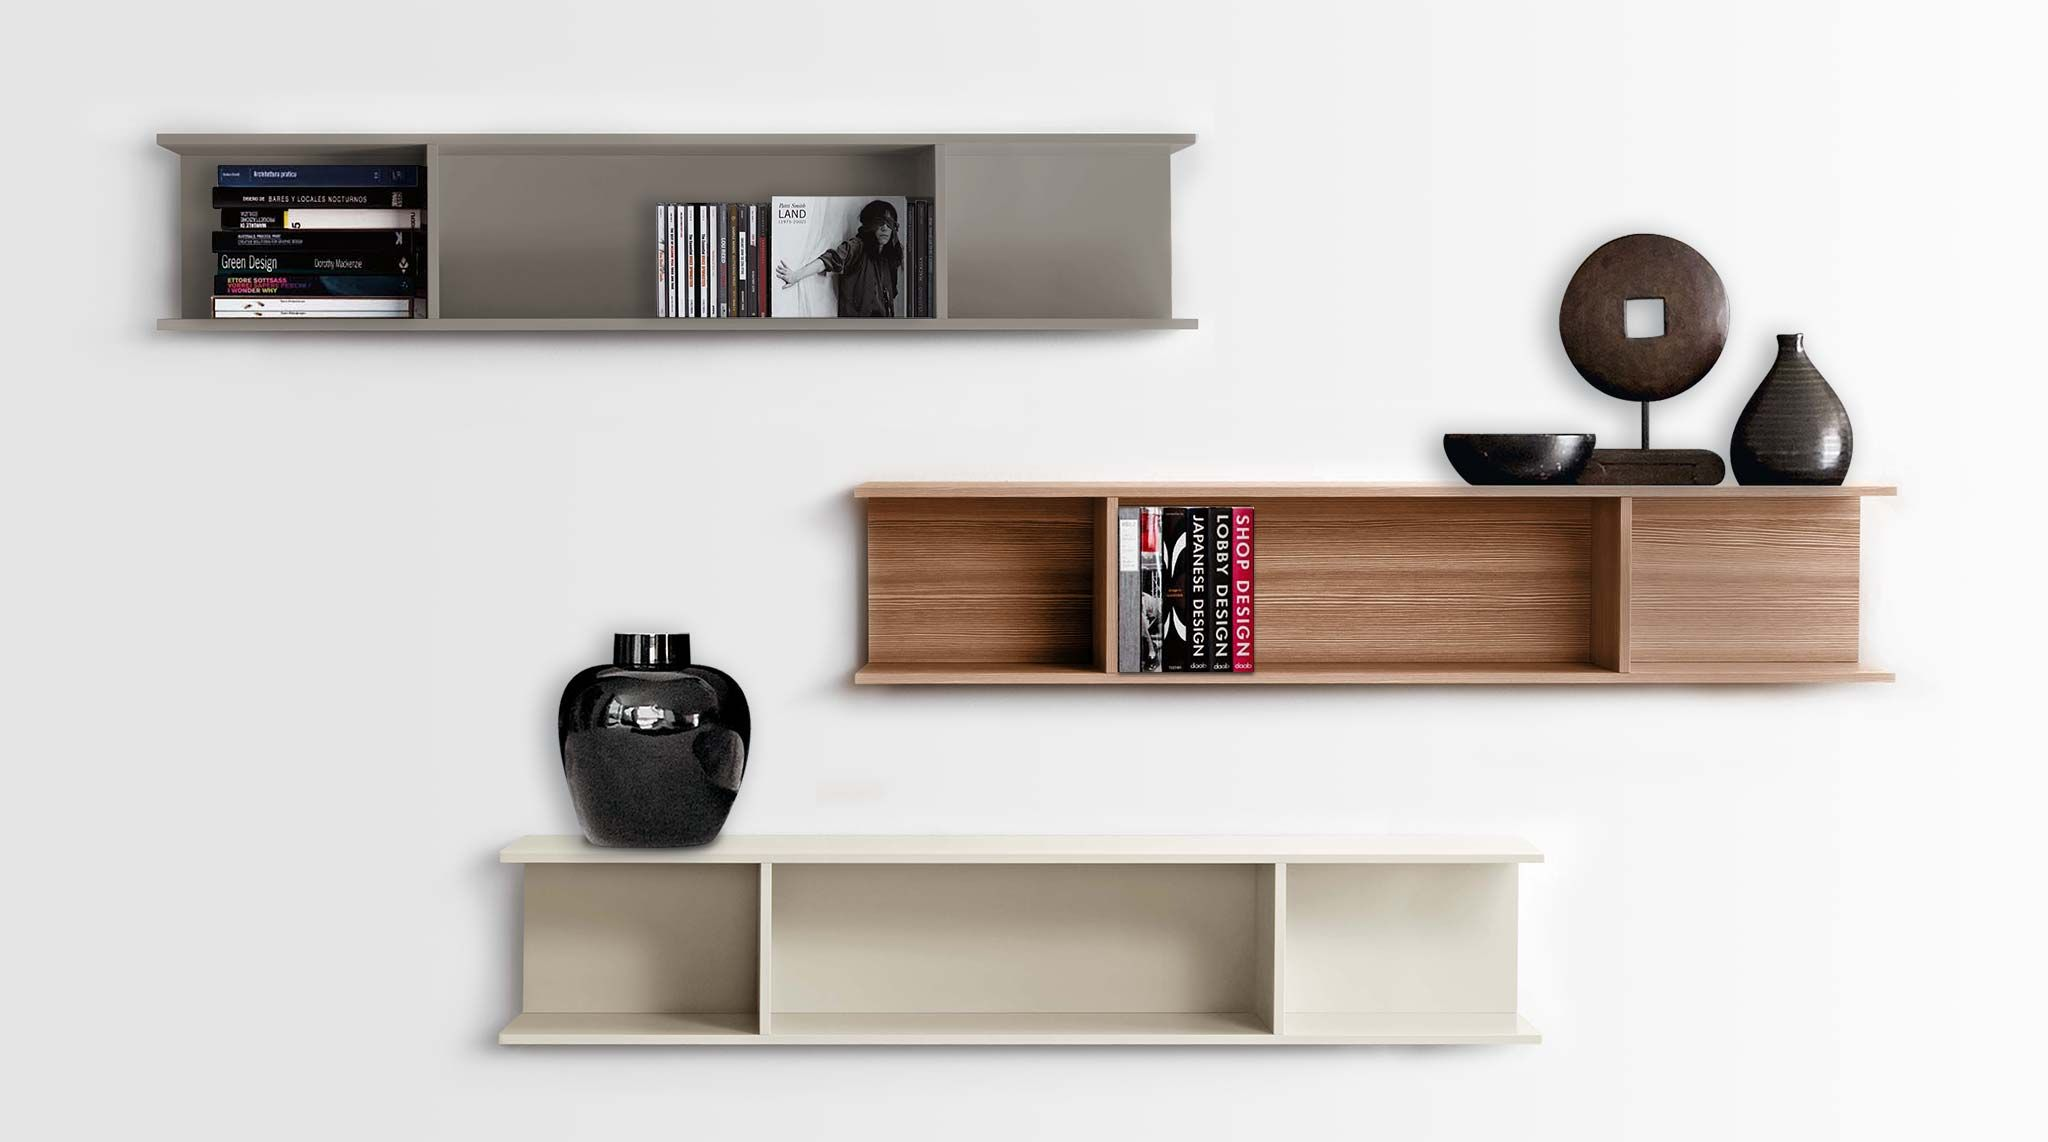 Libreria modulare pensile a muro Light - soloLibrerie   Vendita ...